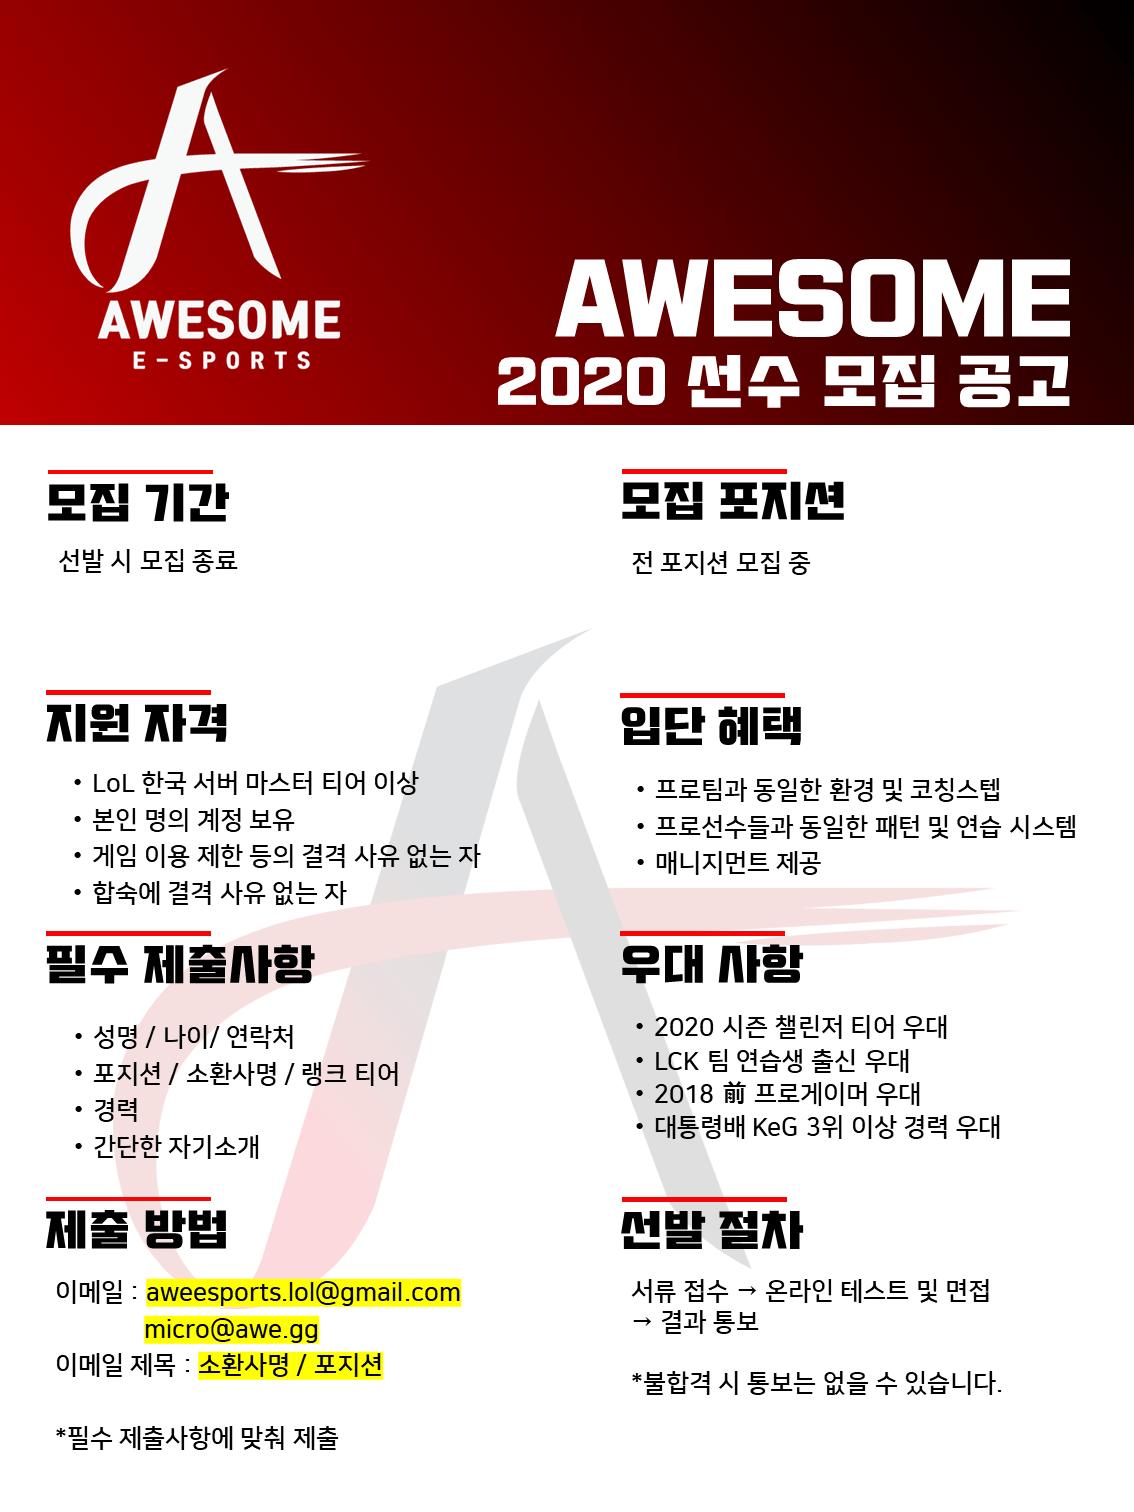 New CI Mw33.png Awesome e-Sports 프로지향 선수 모집 중 (KeG,아카데미리그)